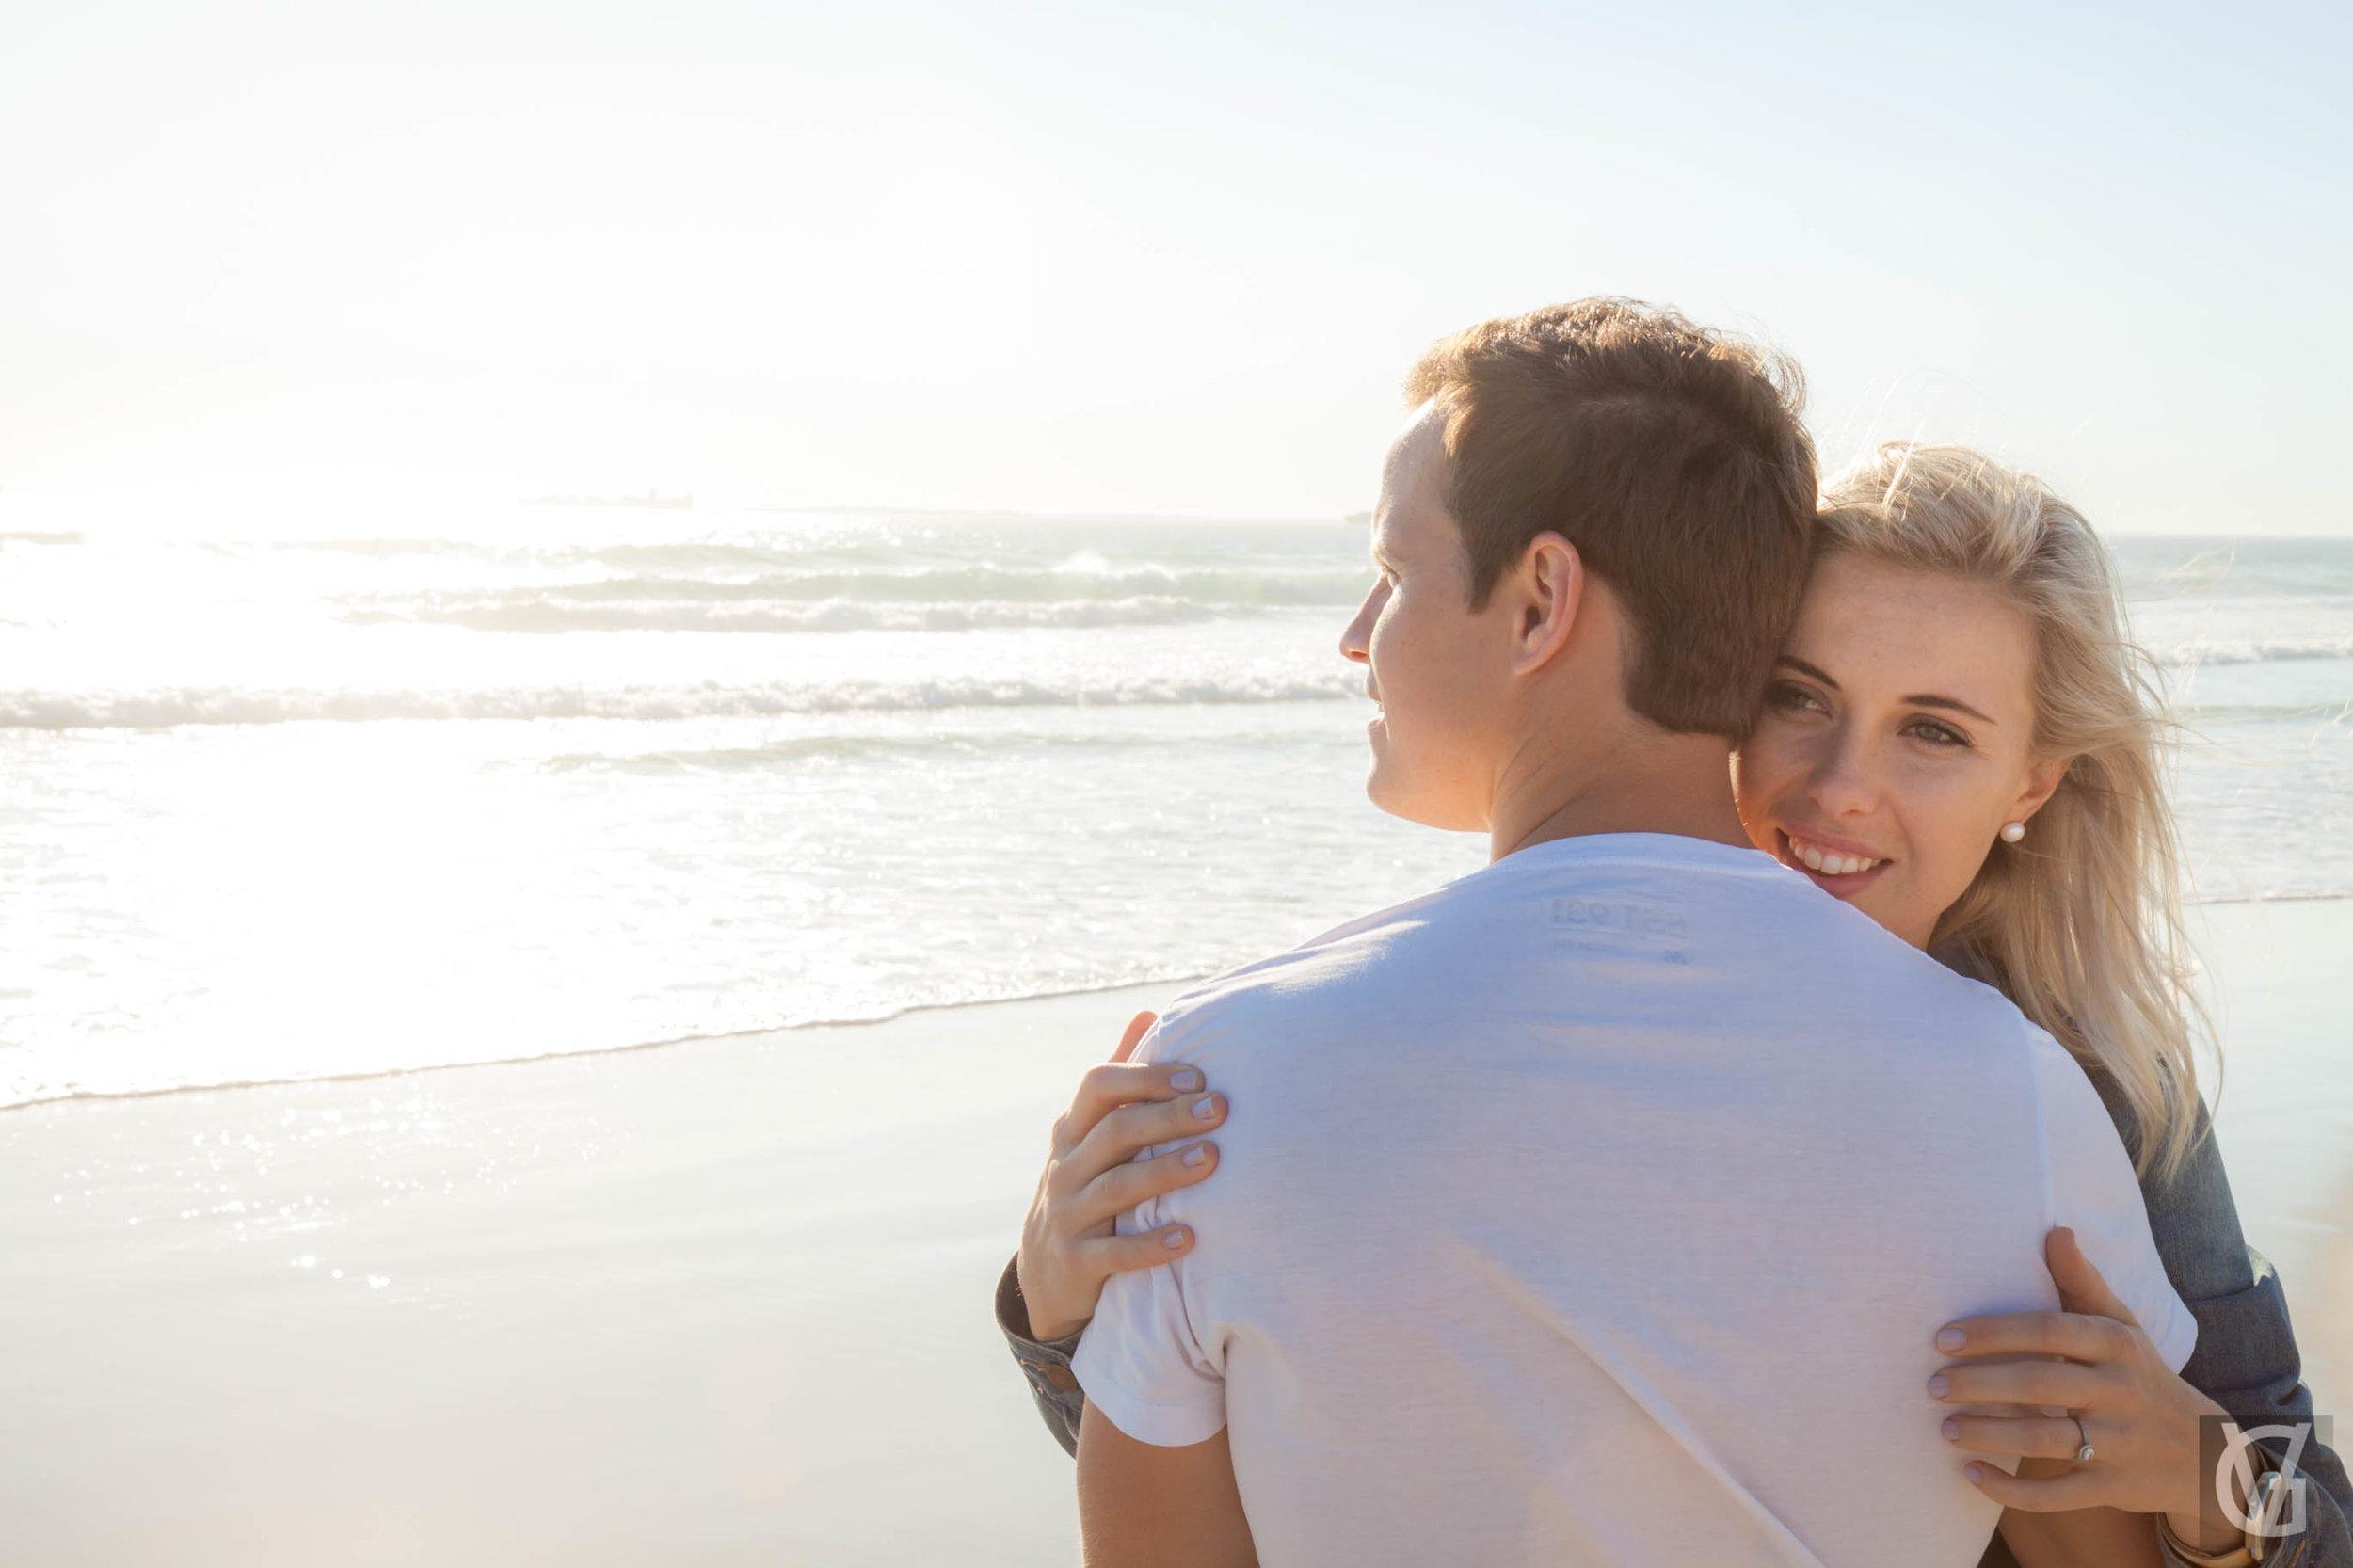 An engaged couple share a hug on the beach at sunset